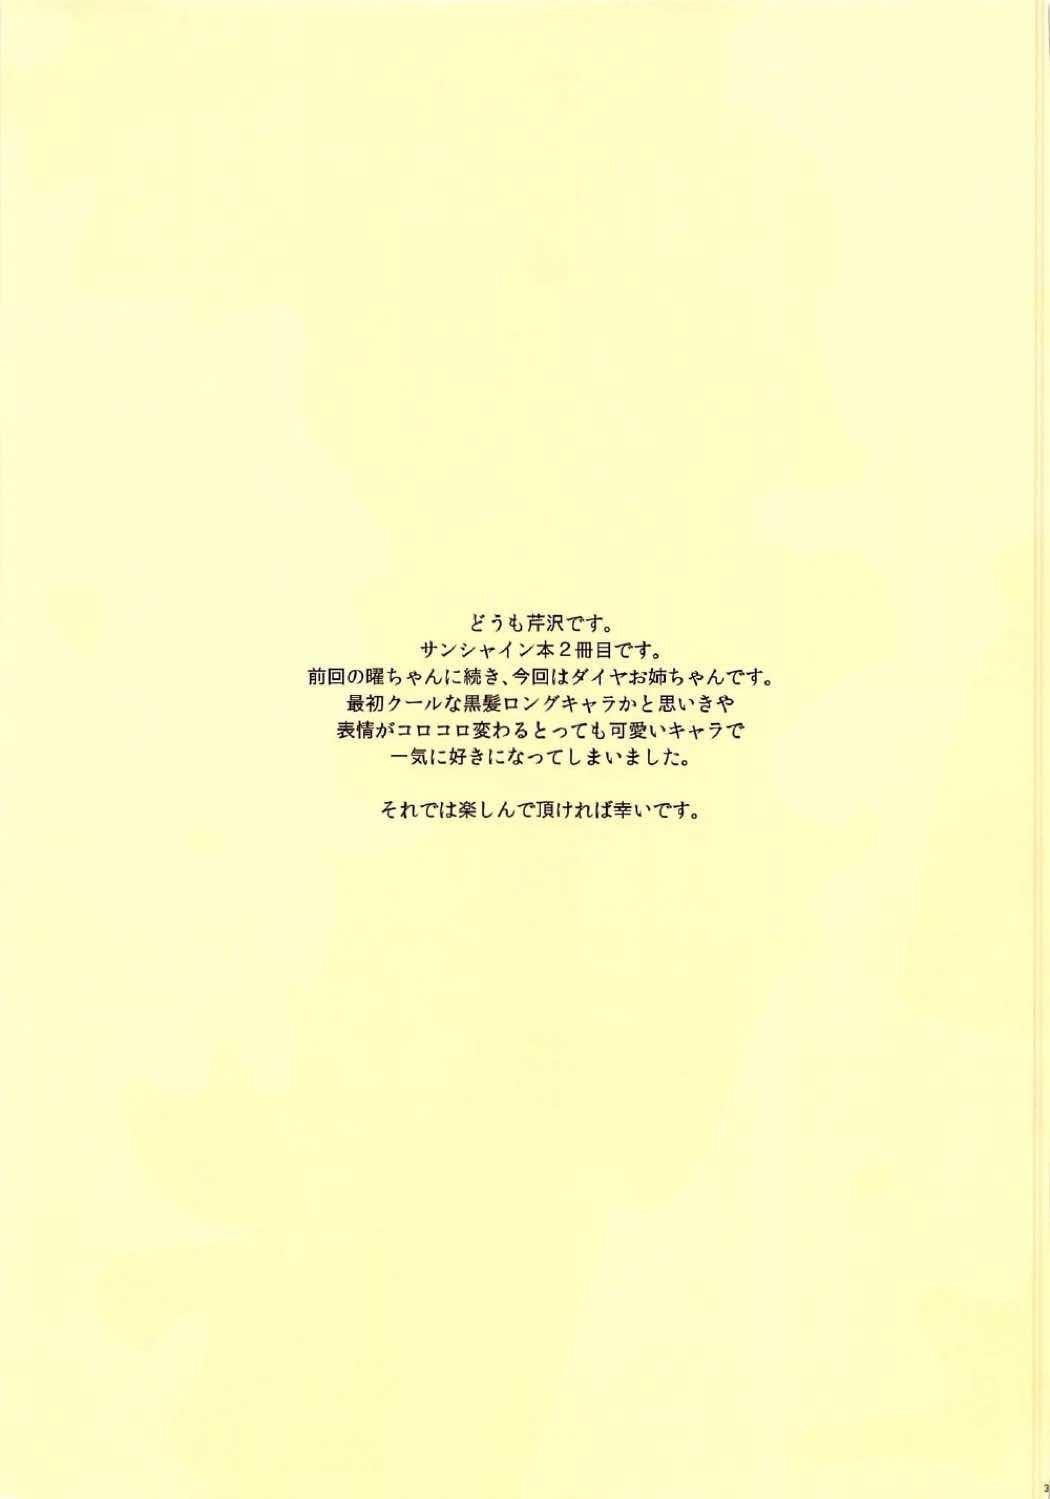 Onee-chan no Himitsu 1